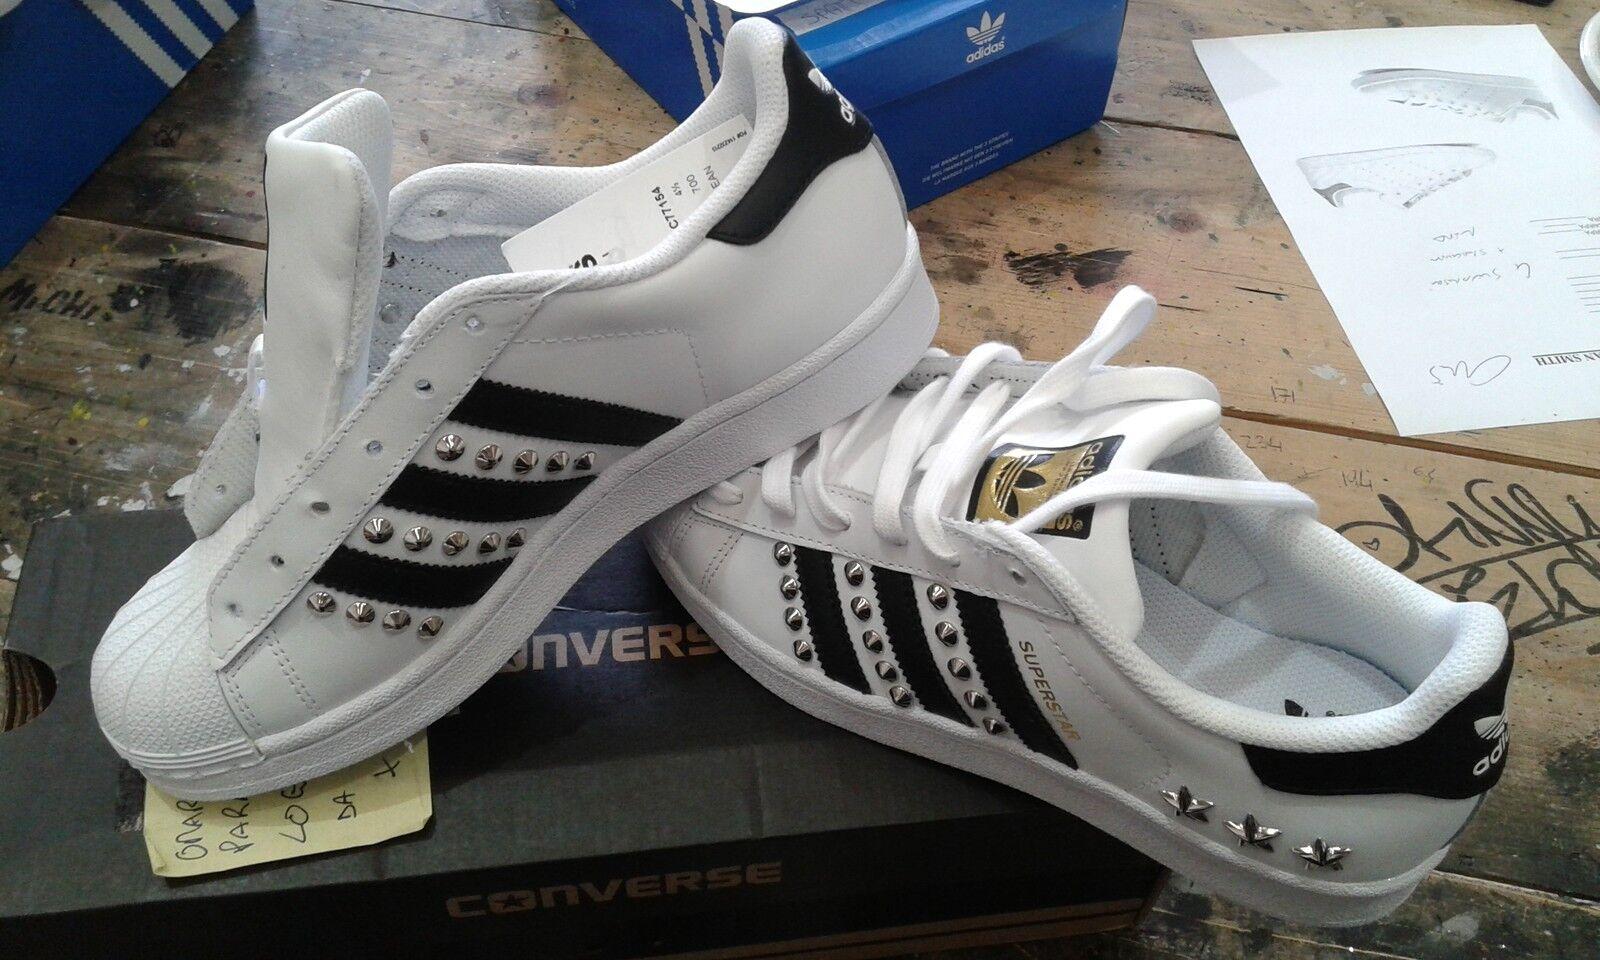 Scarpe adidas superstar con argento borchie argento e stelle argento con 15e4e8